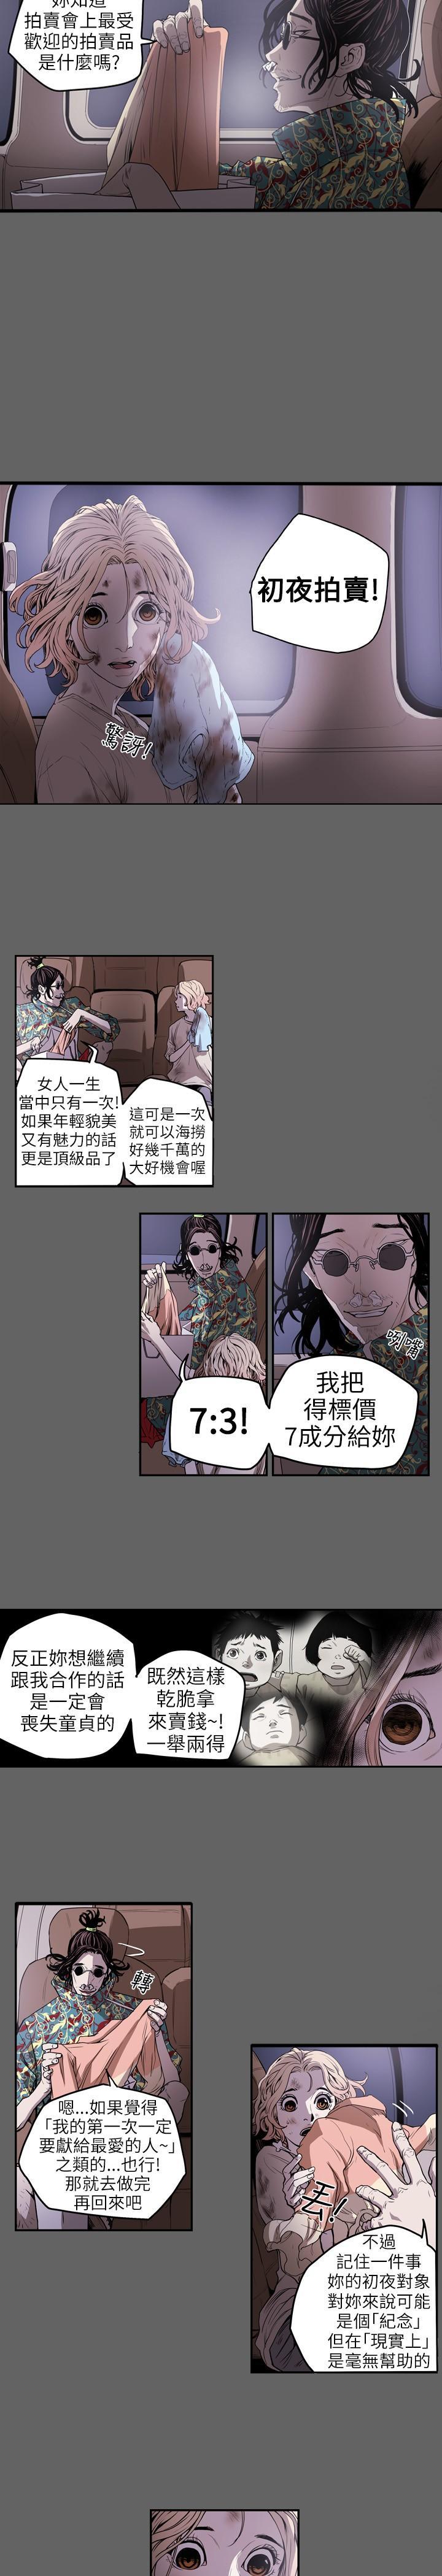 Honey trap 甜蜜陷阱 ch.8-13 5